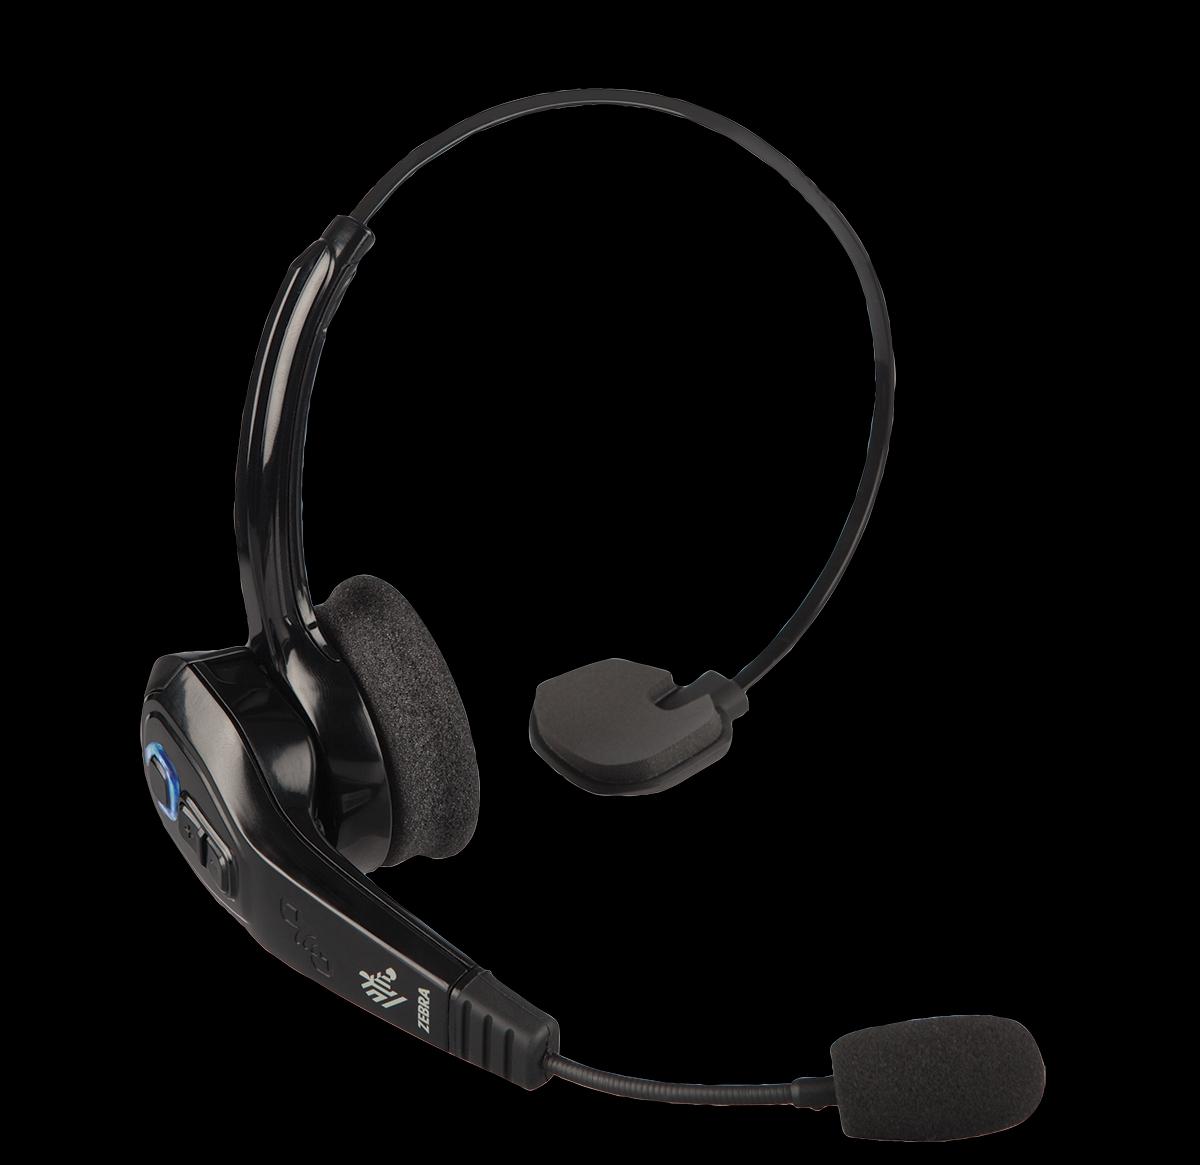 Zebra HS3100 headset